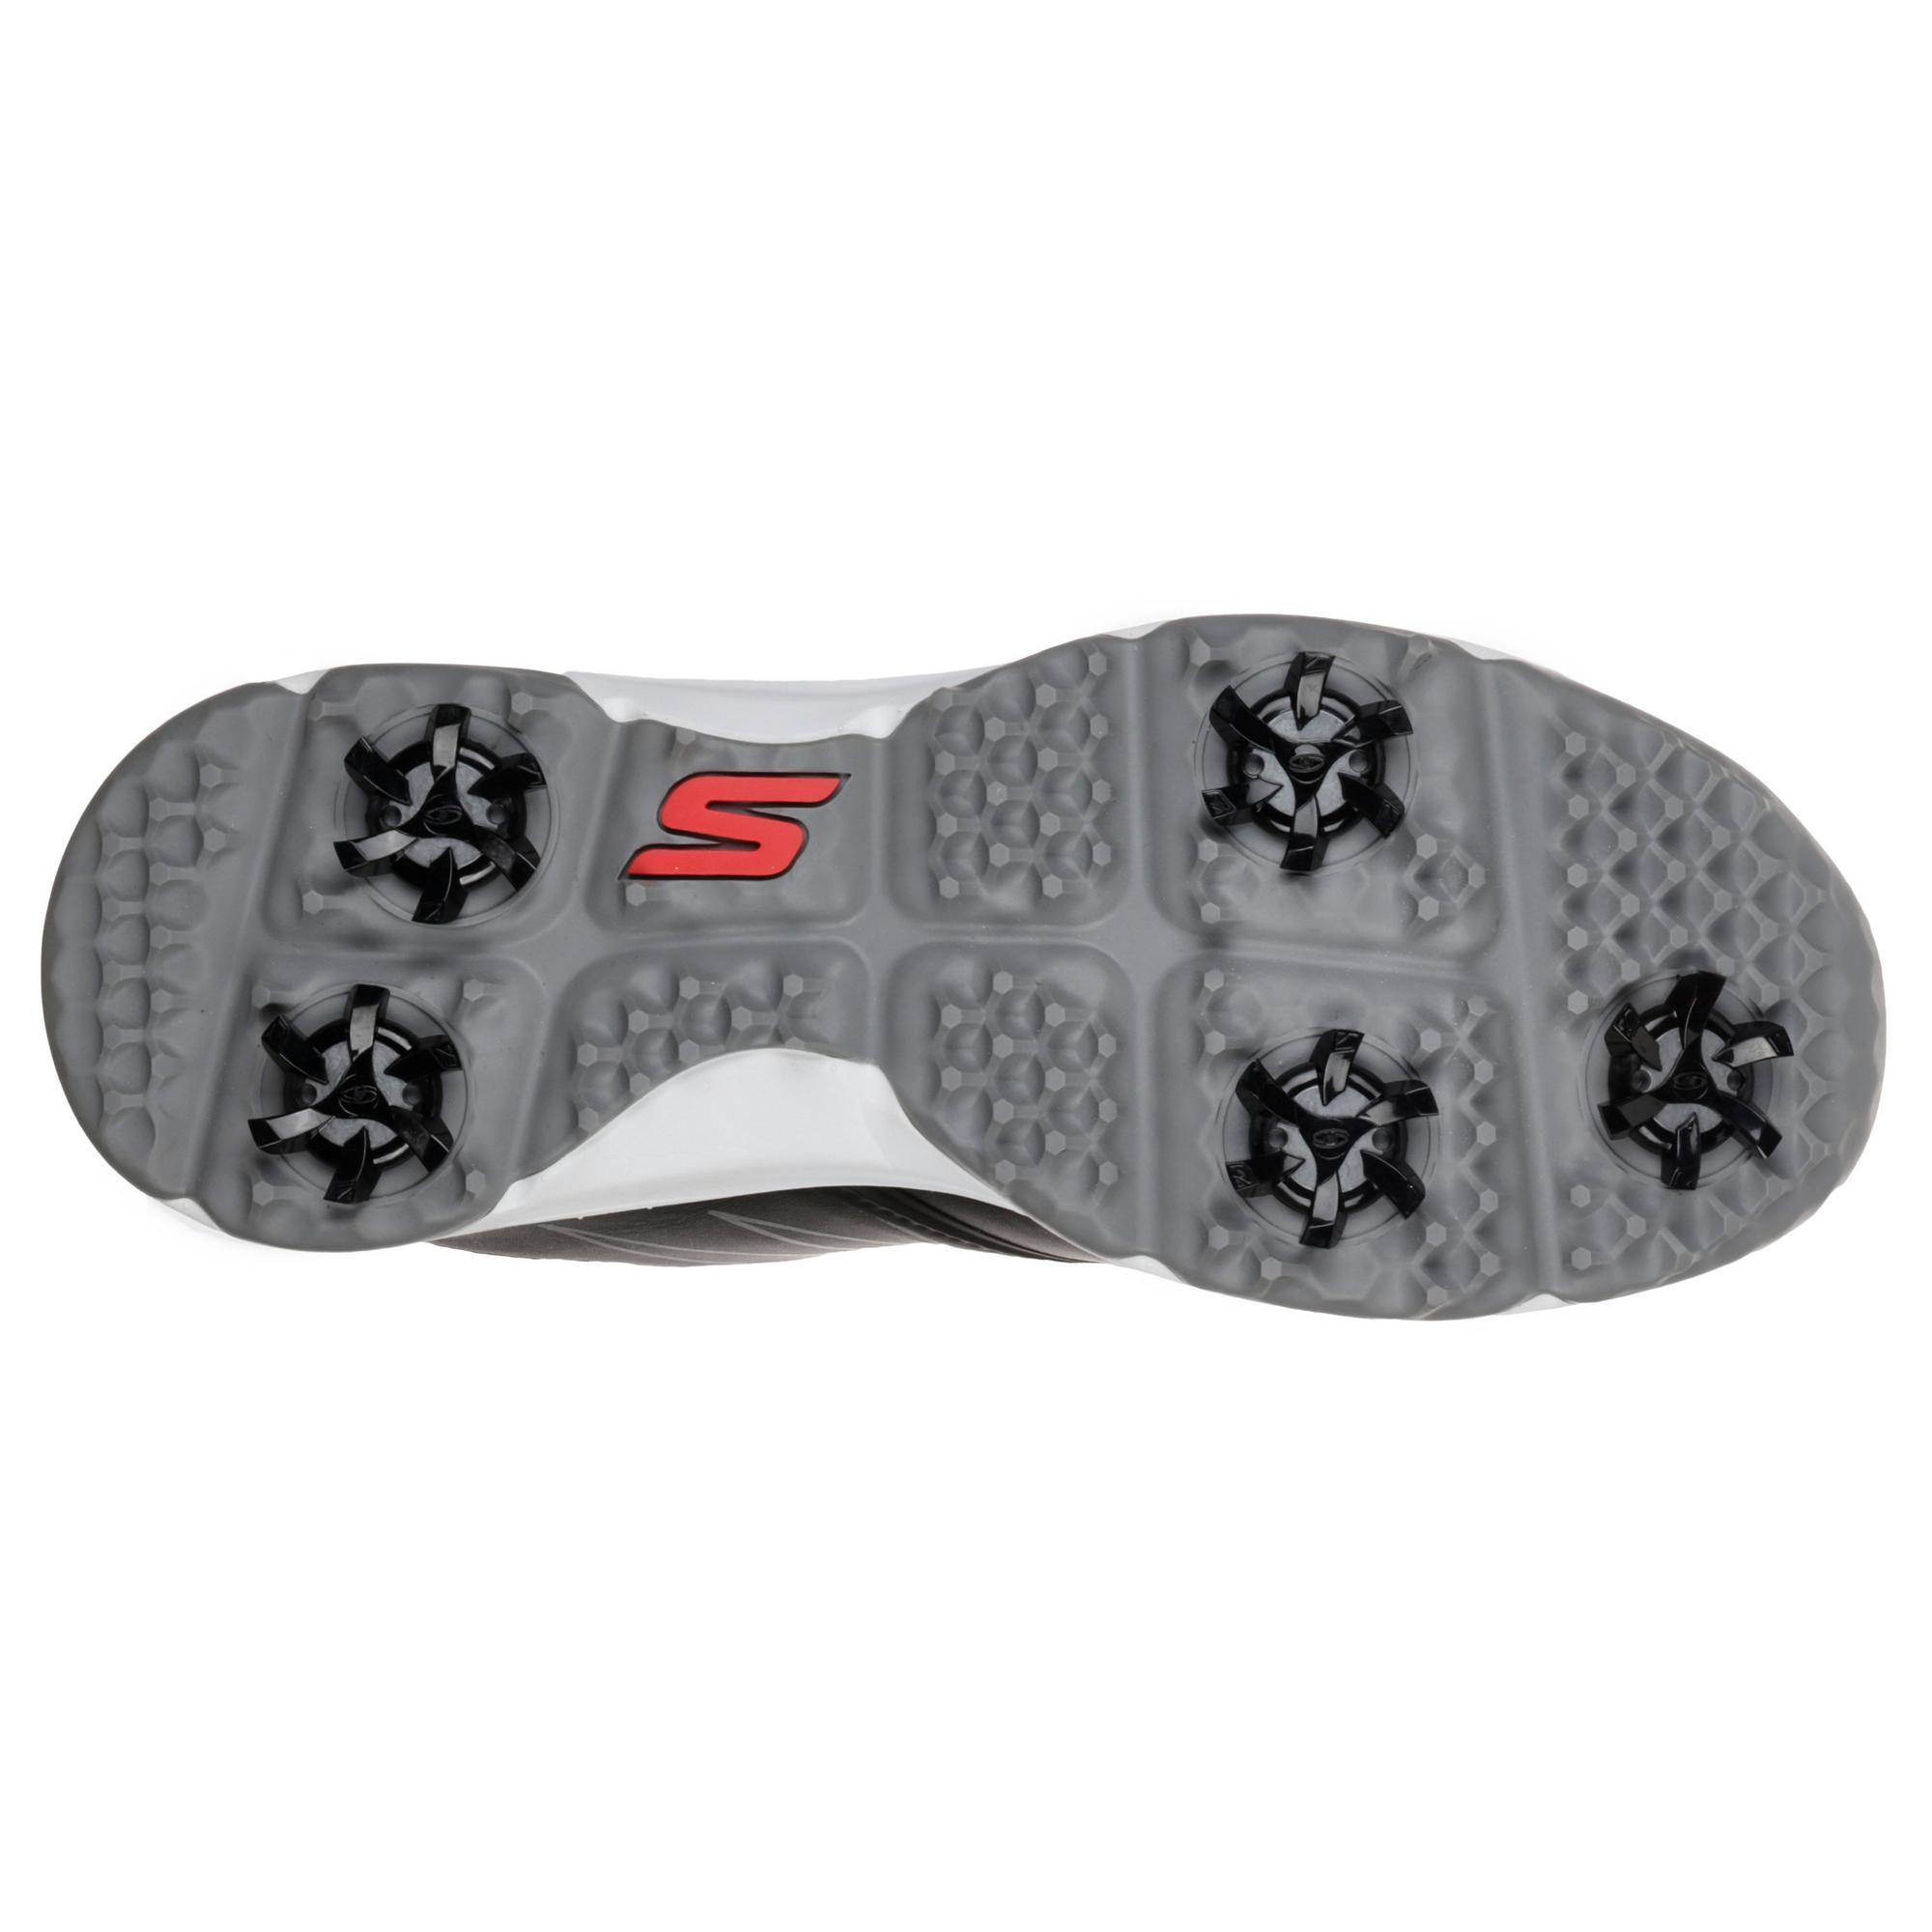 Junior Go Golf Blaster Spikeless Shoe - Black